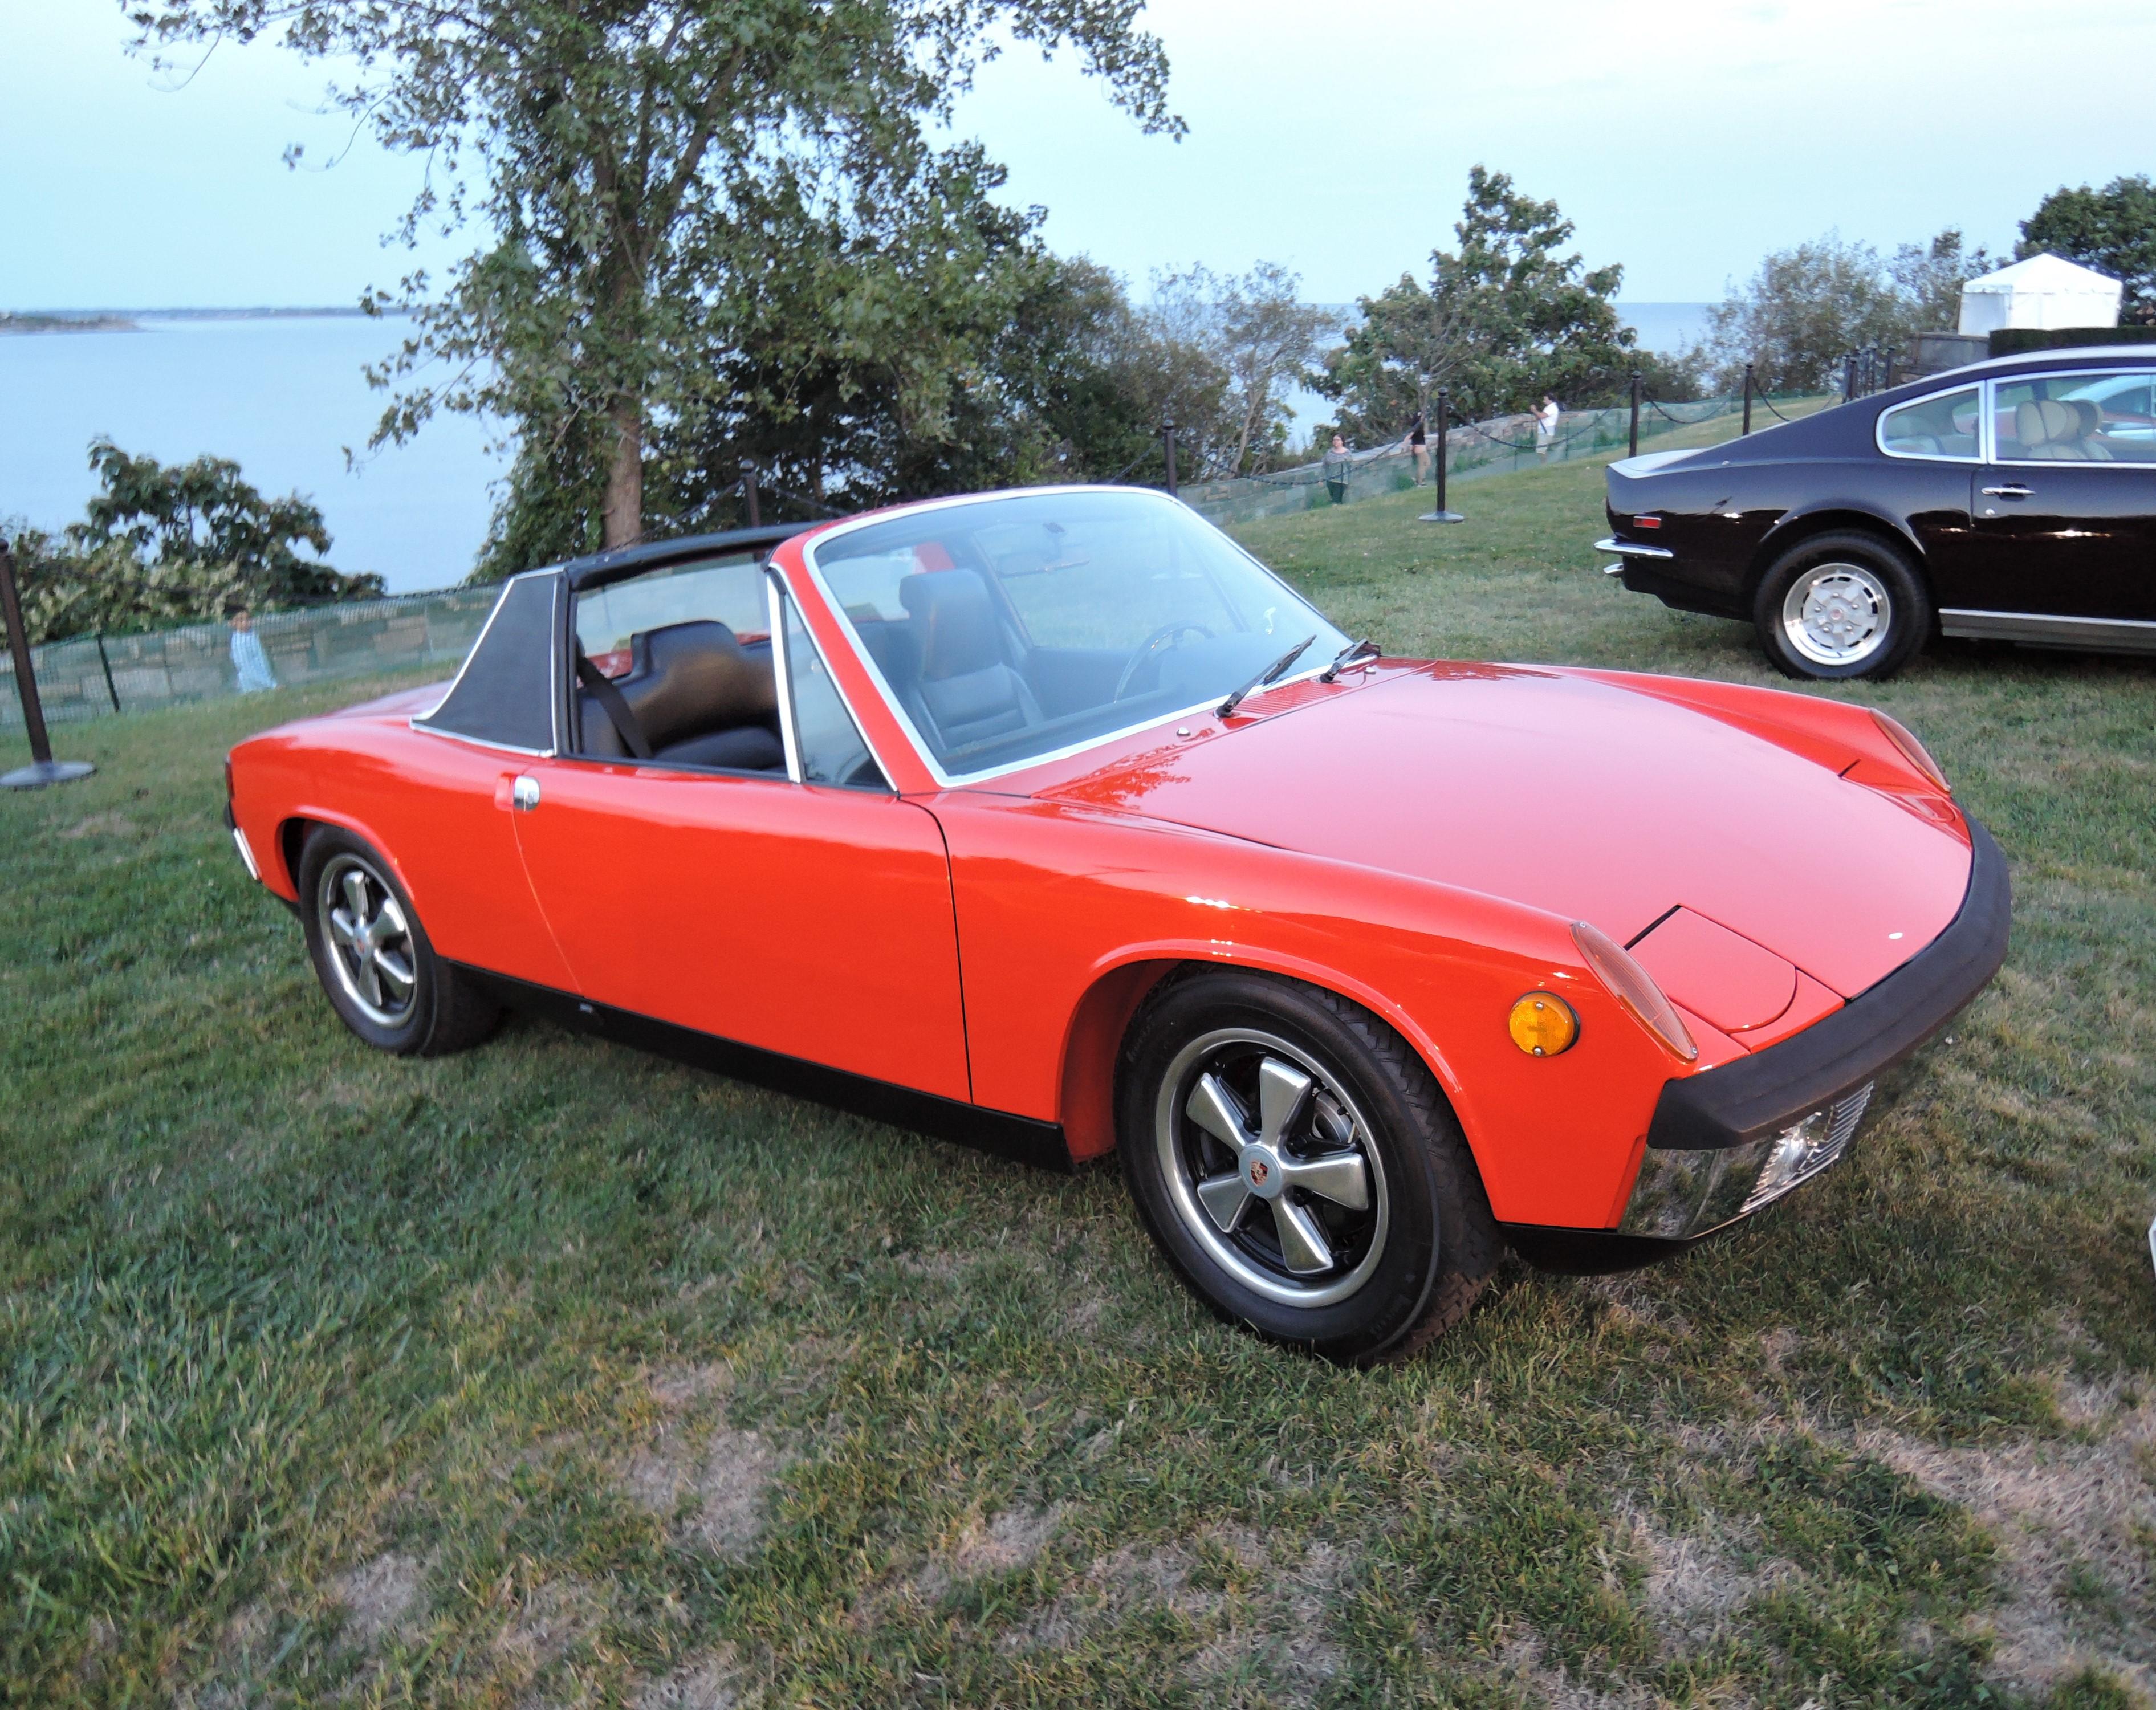 blood orange tangerine 1971 Porsche 914-6 Targa - Audrain Auto Museum Gala 2017